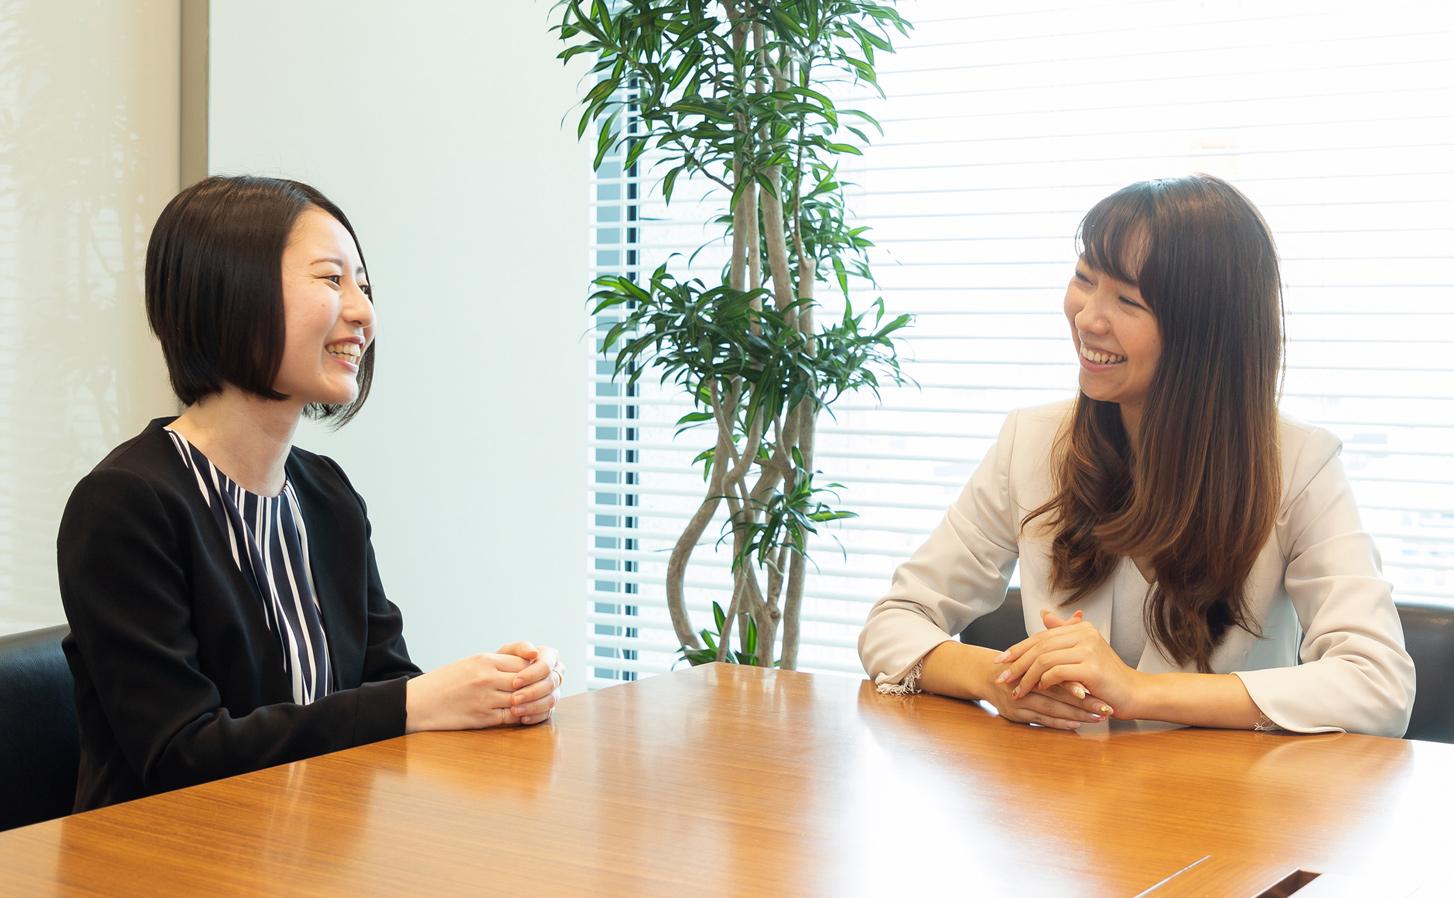 KPMG P&C マネジャー、コンサルタント インタビュー(座談会)